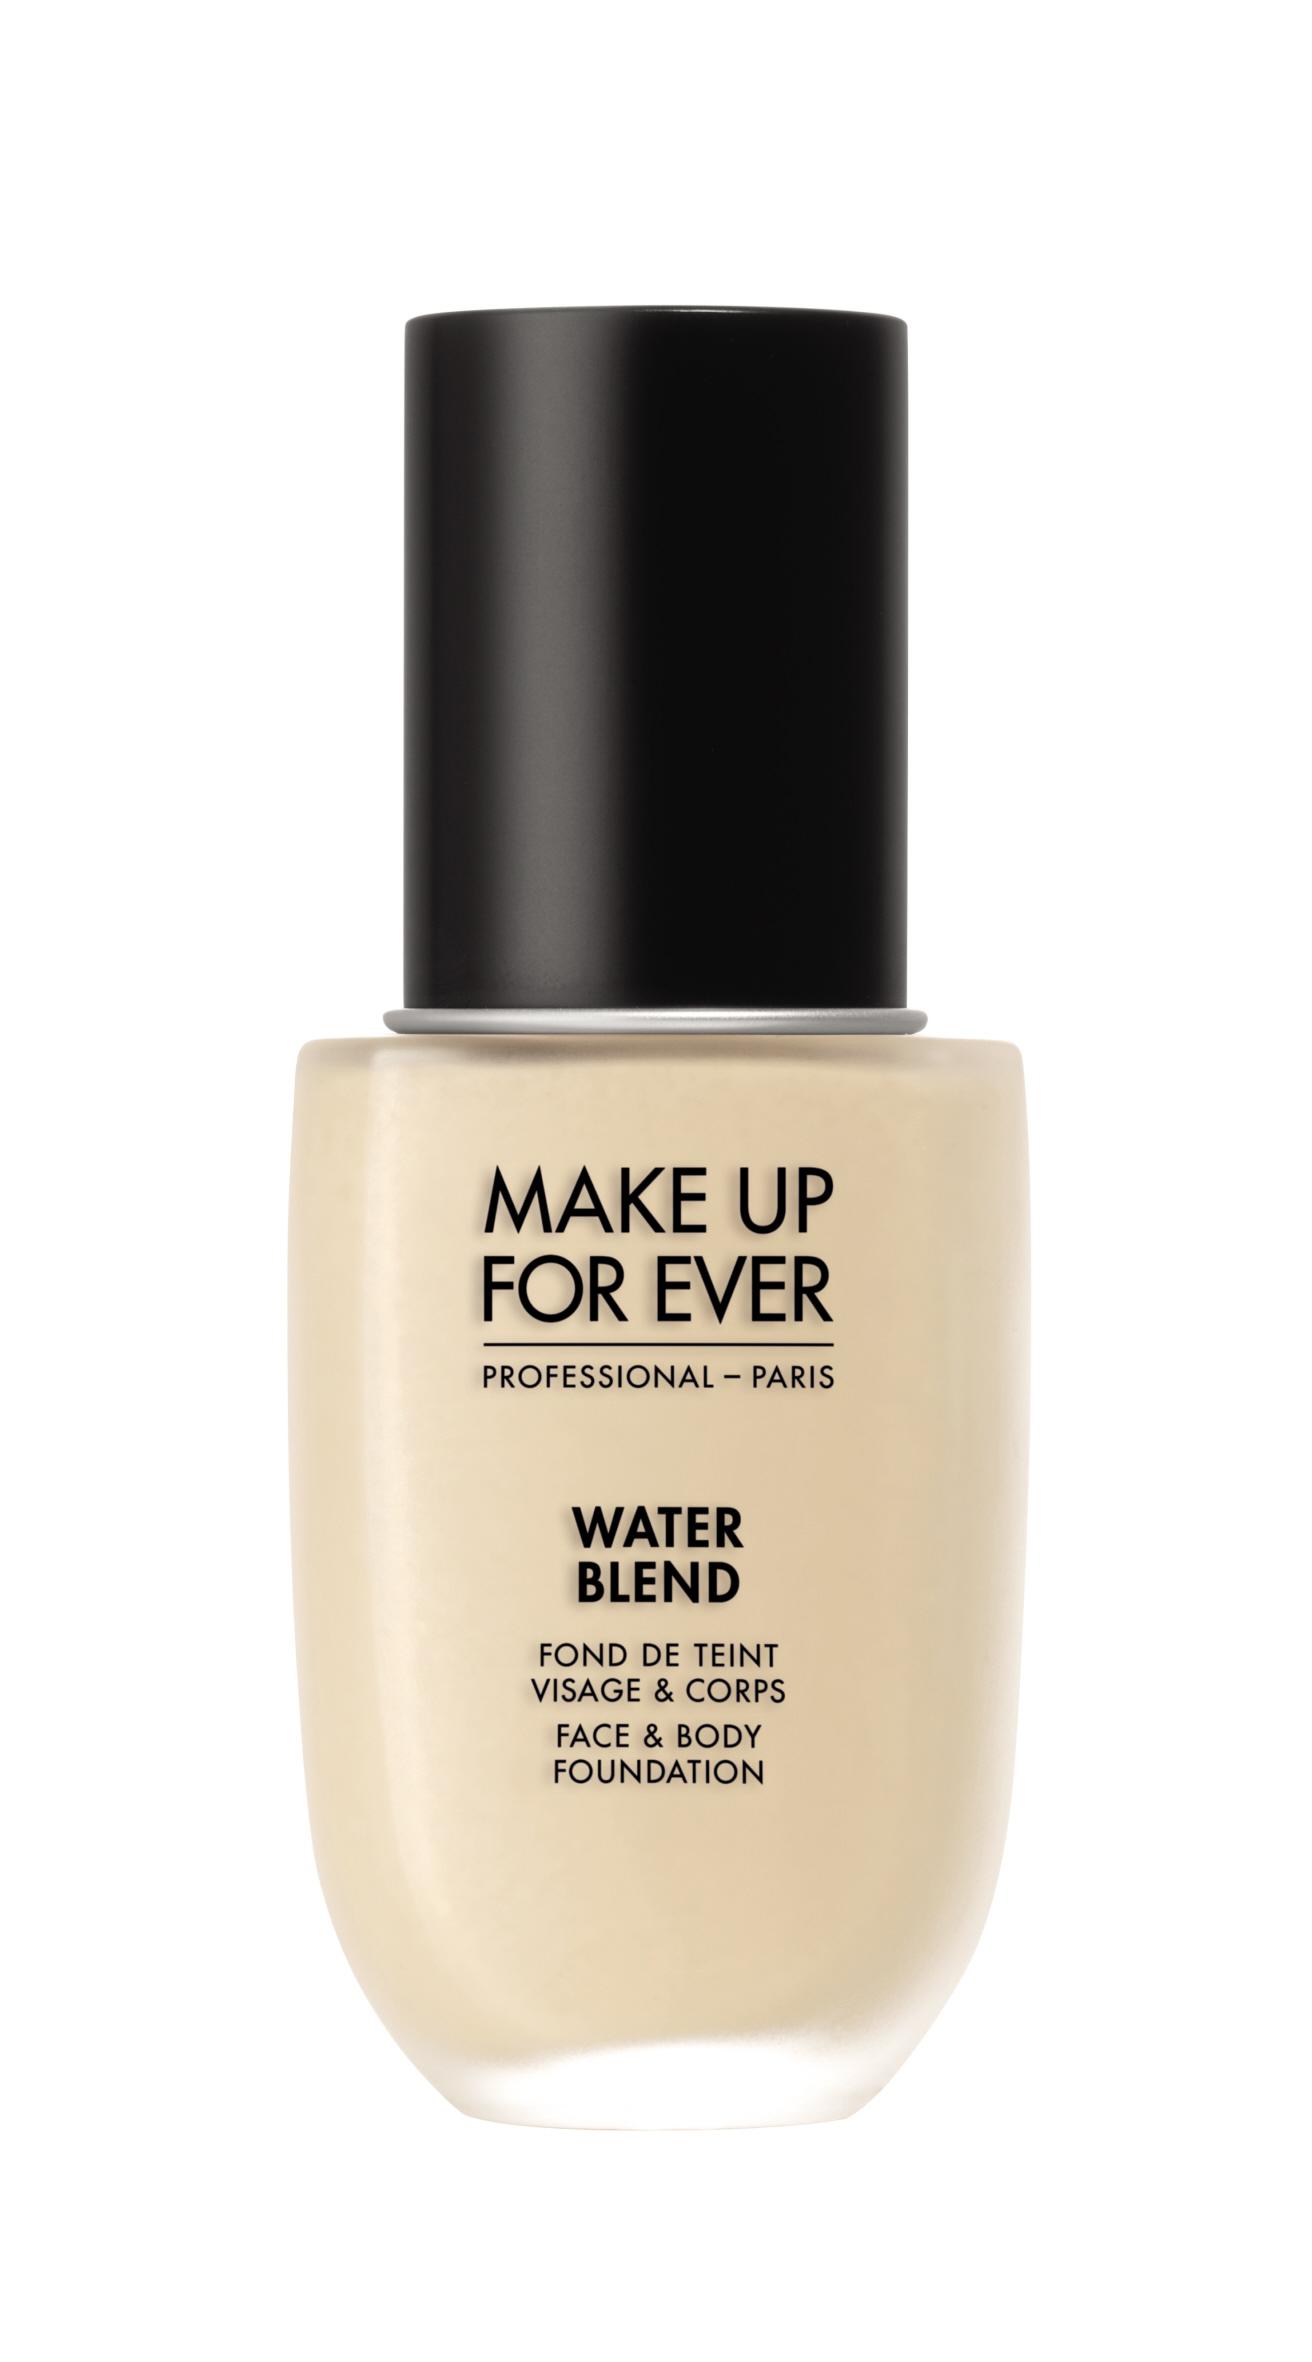 Тональный крем на водной основе для лица Water blend face & body foundation 50 мл (Y215 Желтый алабастер) Make Up For Ever